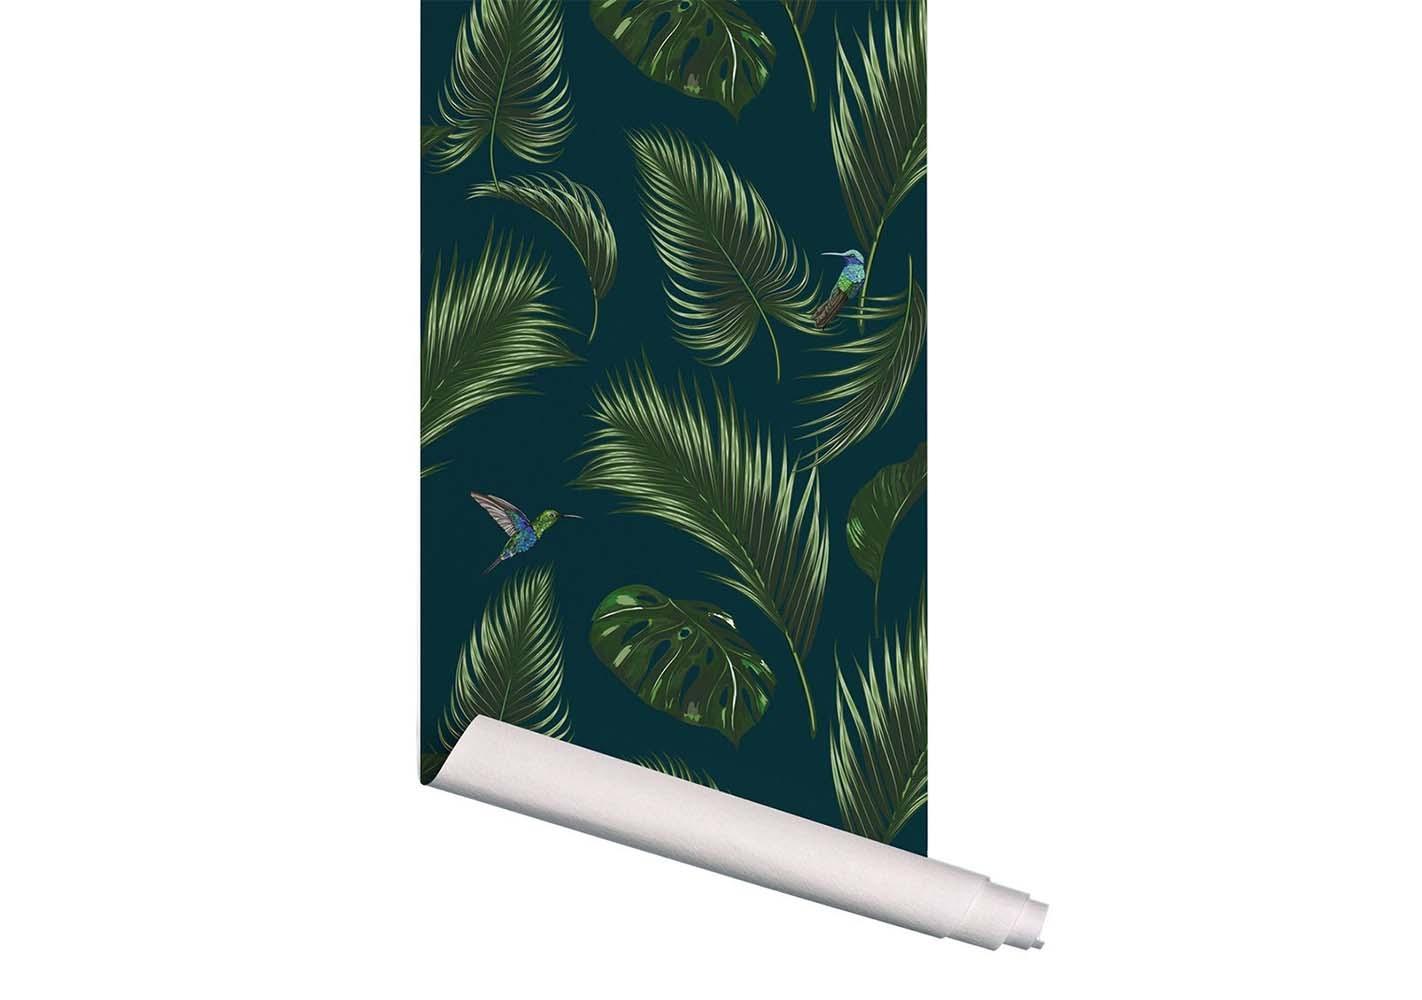 Papier peint Jungle Bleu canard - PAPERMINT